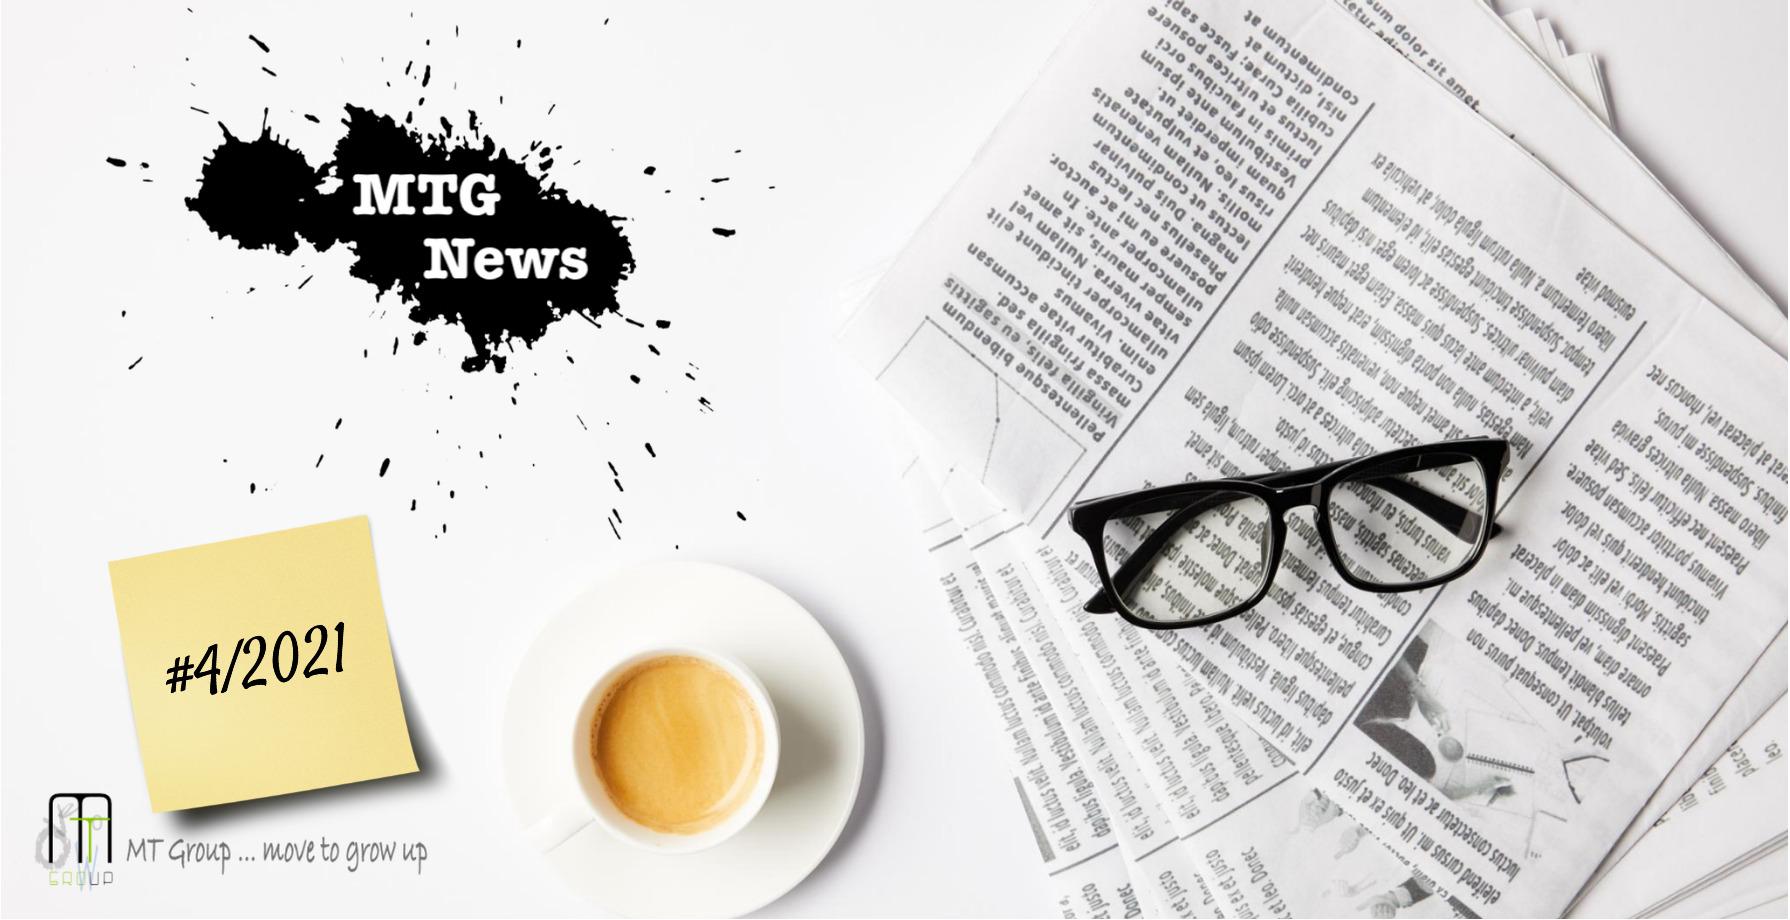 MTG News